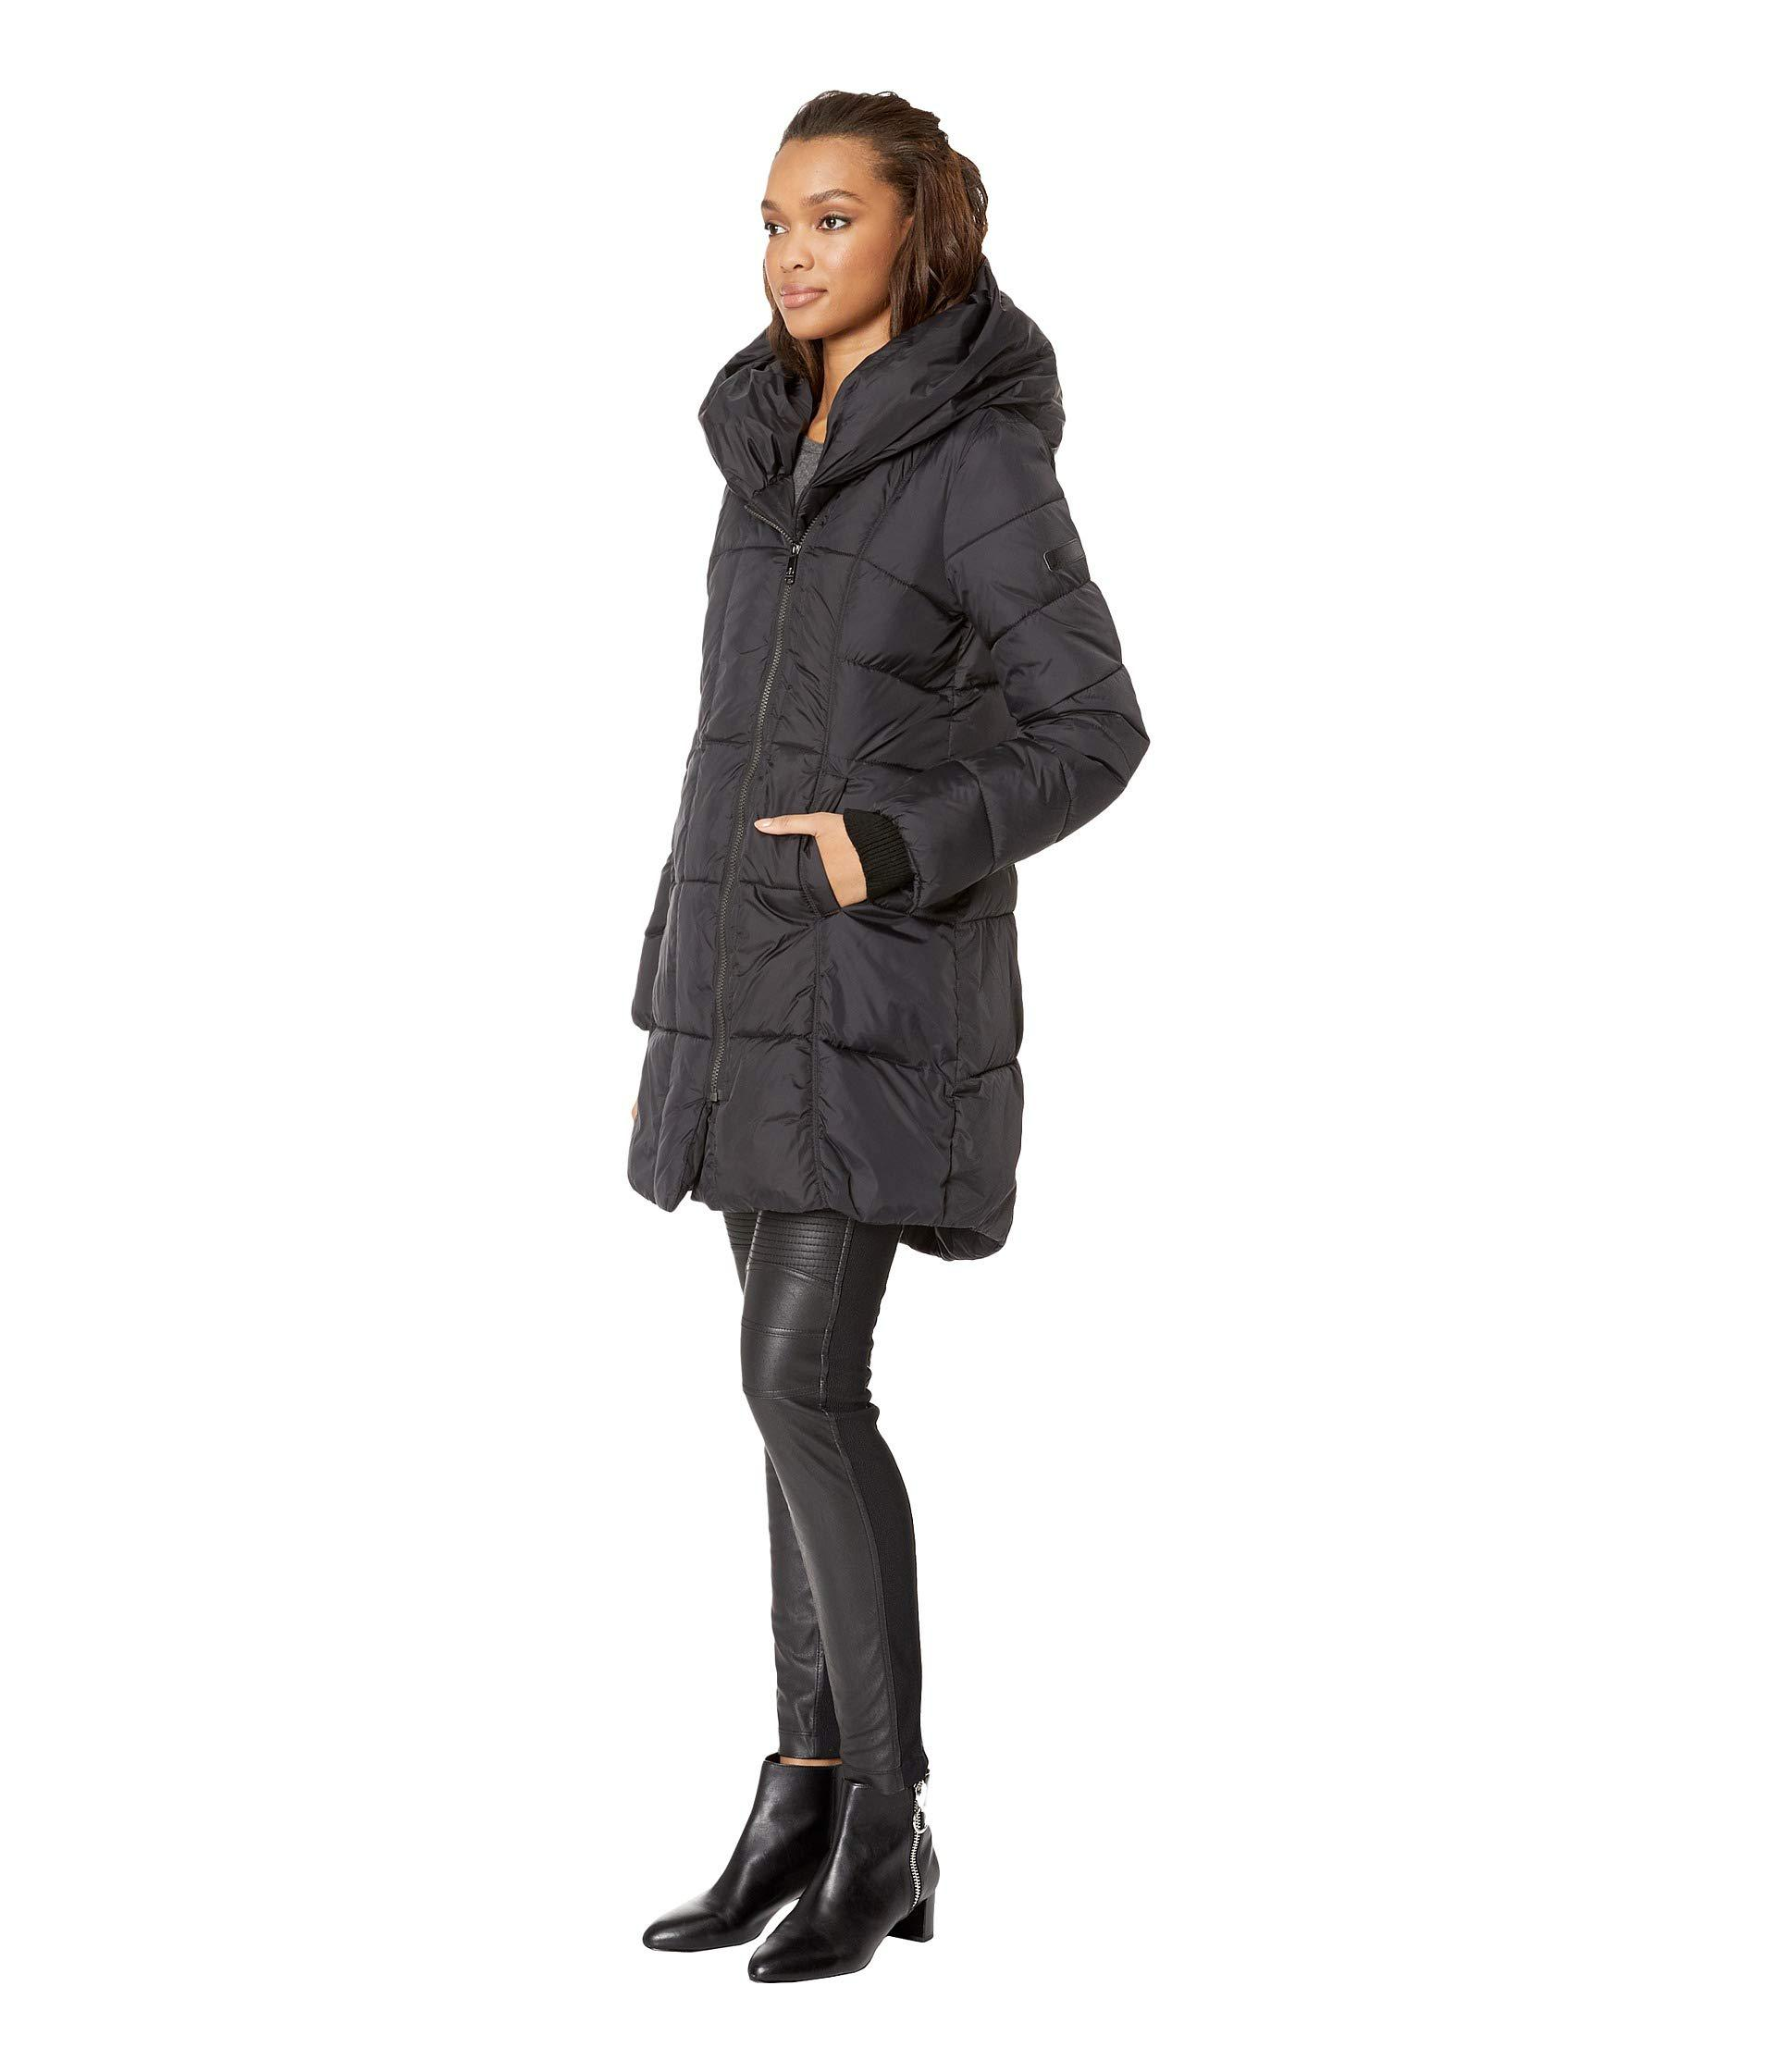 Lyst - Sam Edelman Pillow Collar Puffer Jacket (black) Women s Coat in Black  - Save 8% 59eac6e4cf